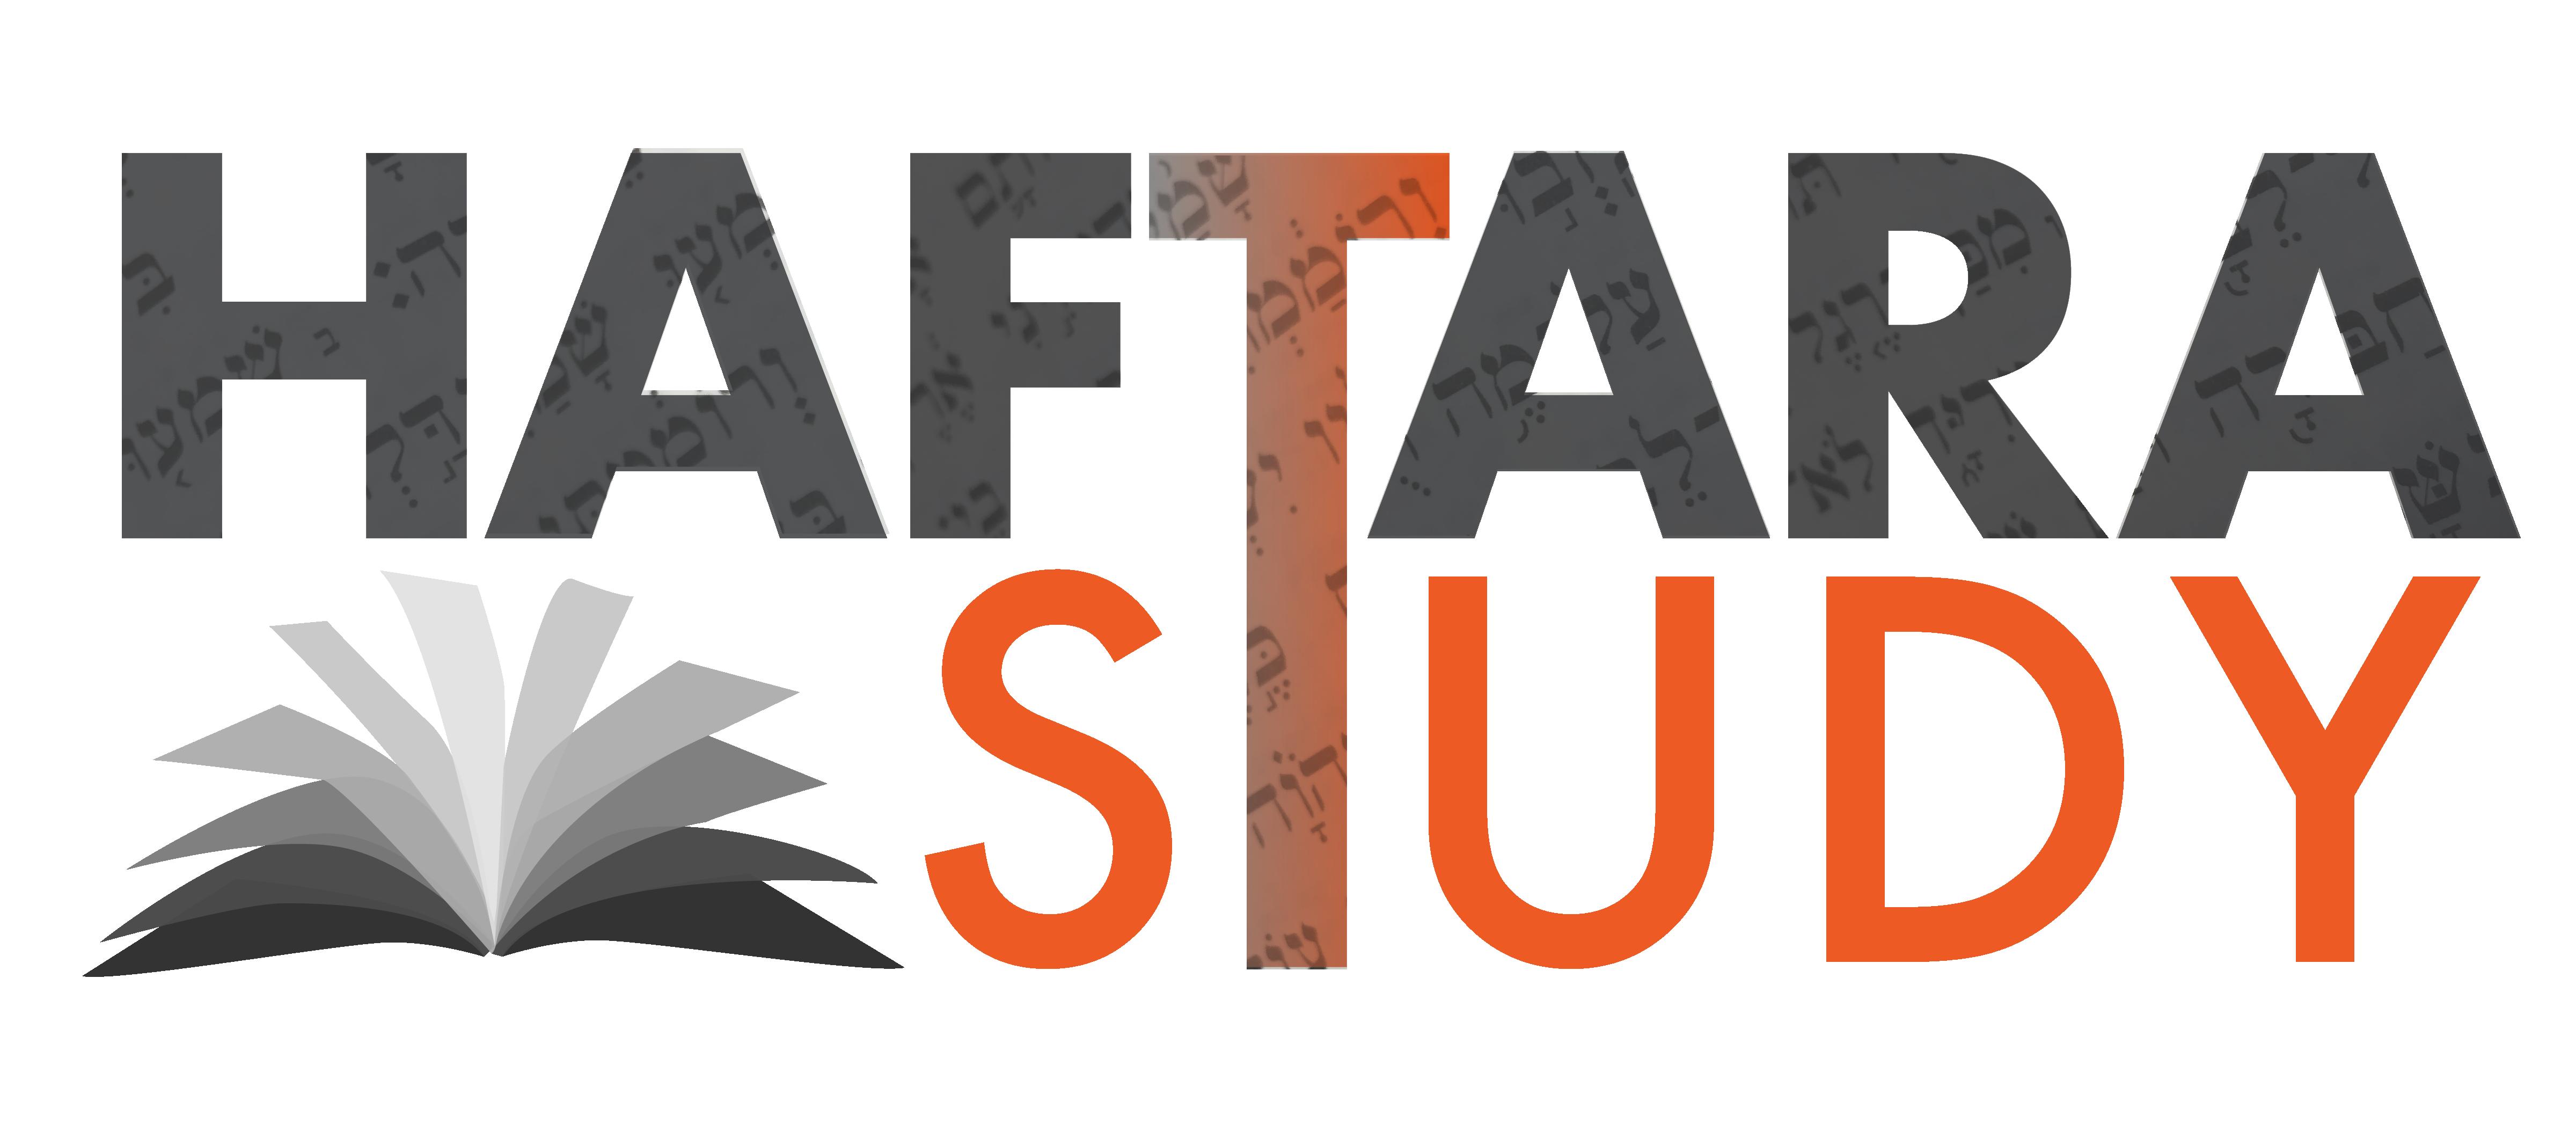 Haftara Study Logo